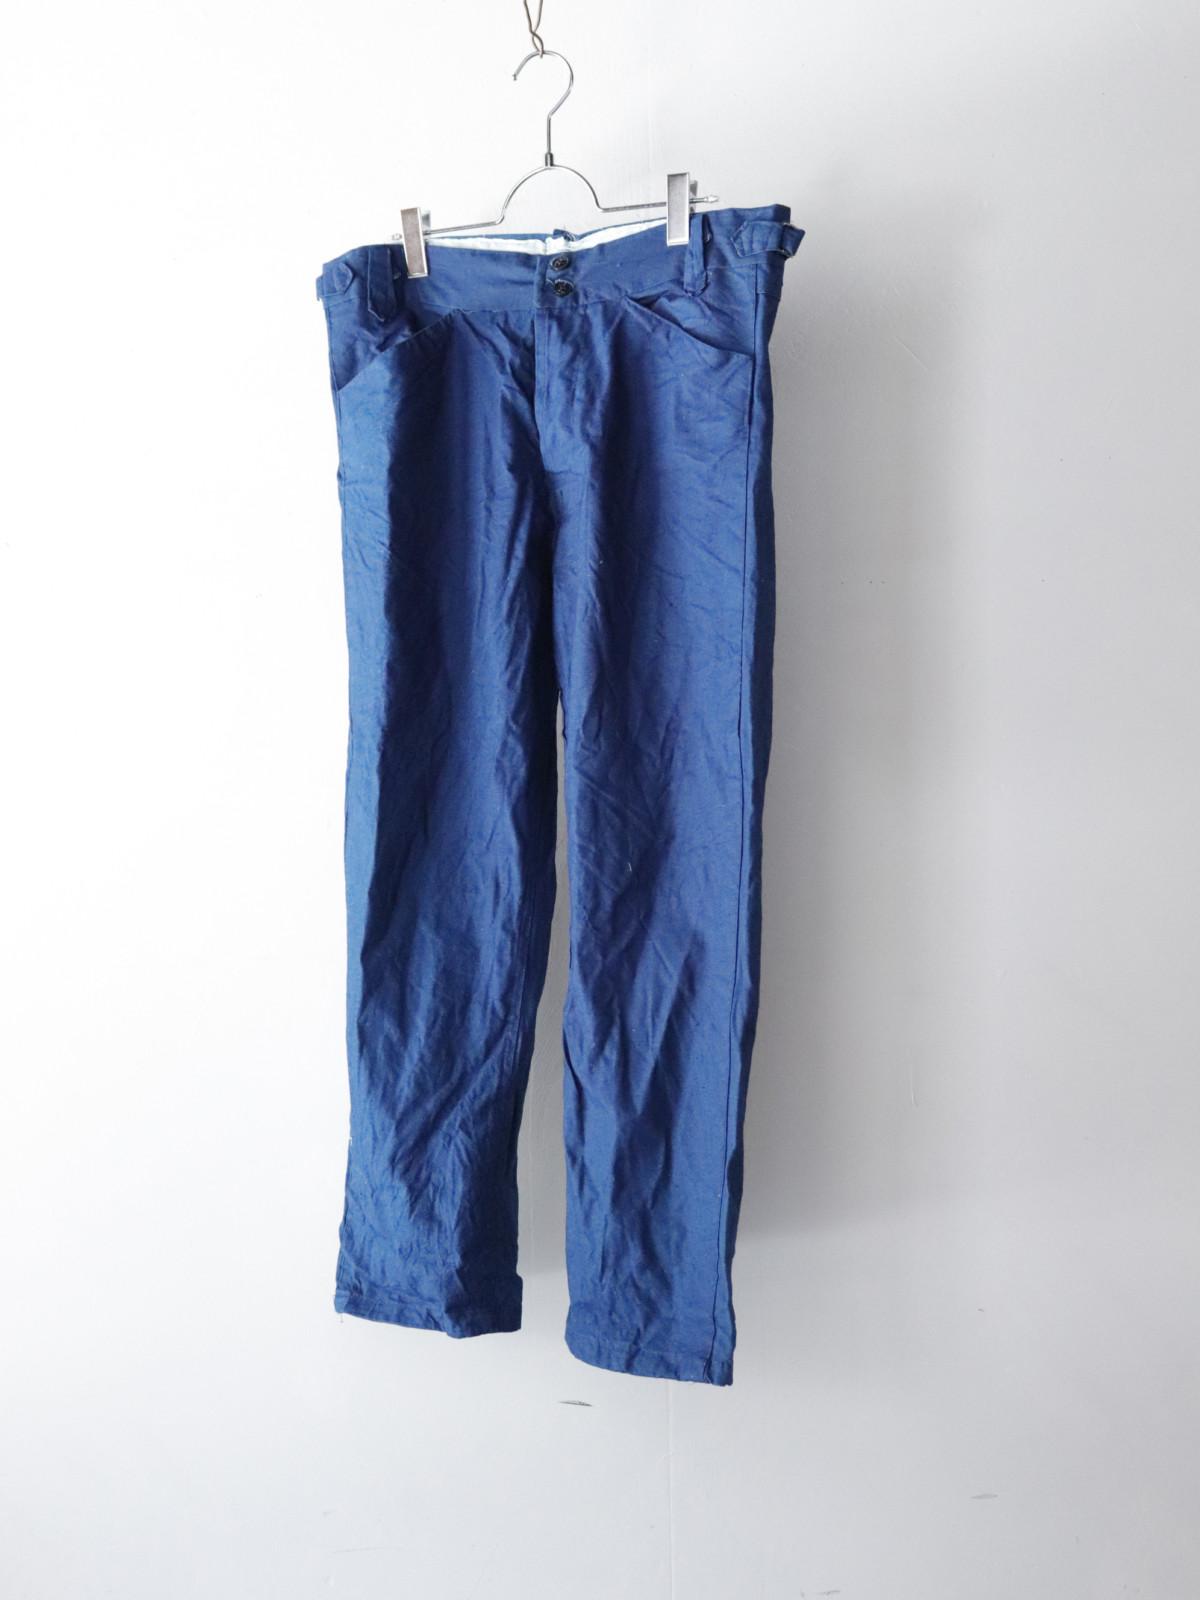 indigo cotton, work pants, France,